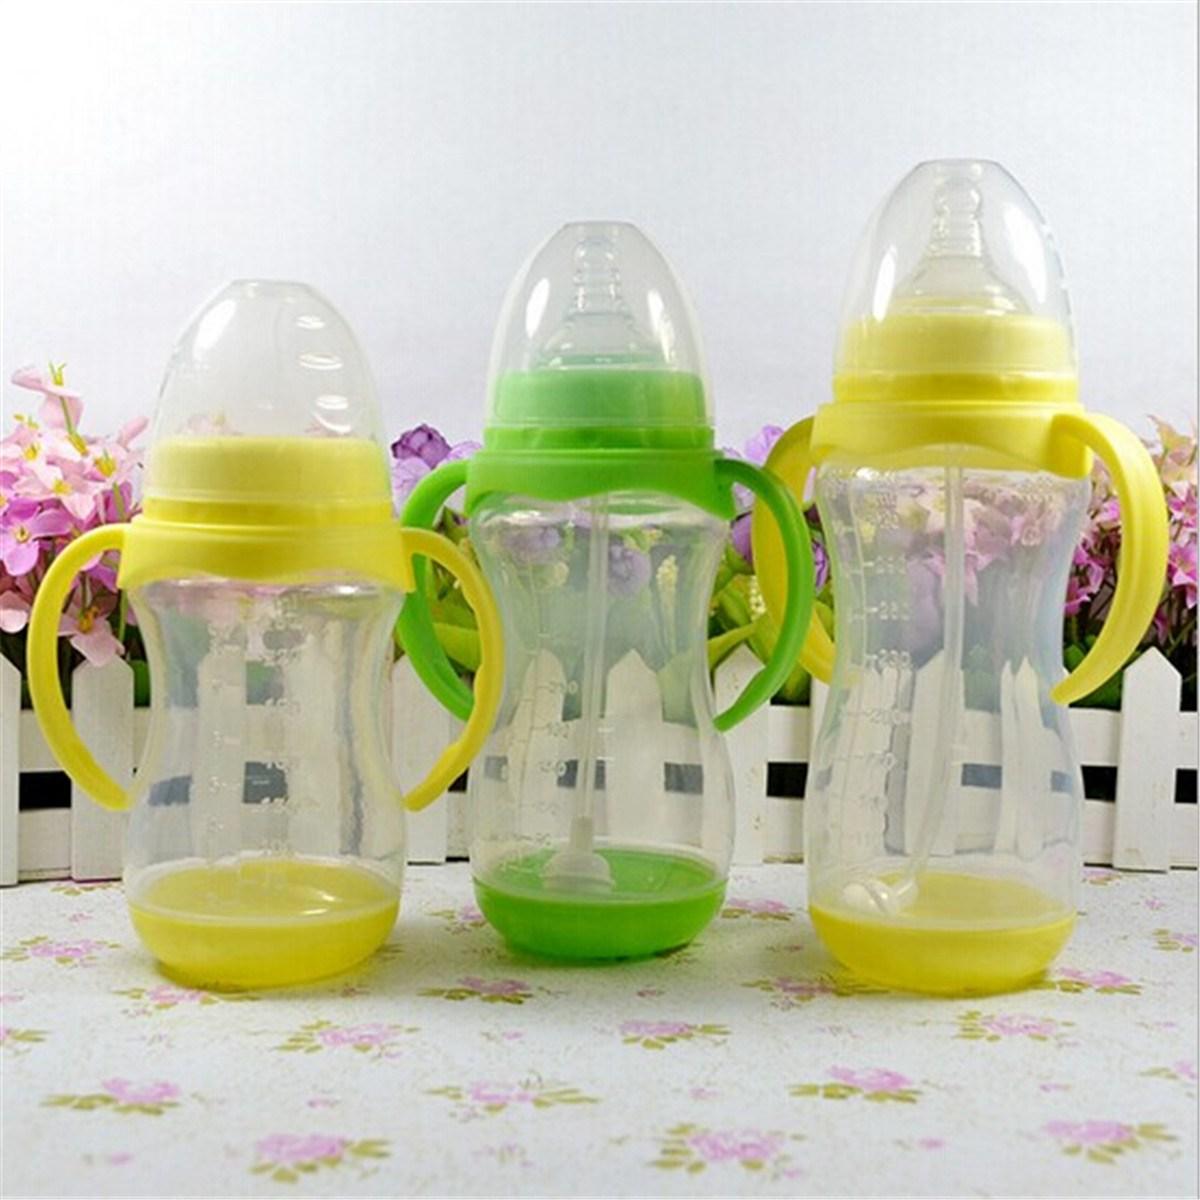 Детская бутылочка для кормления Brand New 250 PP Feeding Bottle детская бутылочка для кормления new brand mamadeira vidro yoyo pp baby b 33